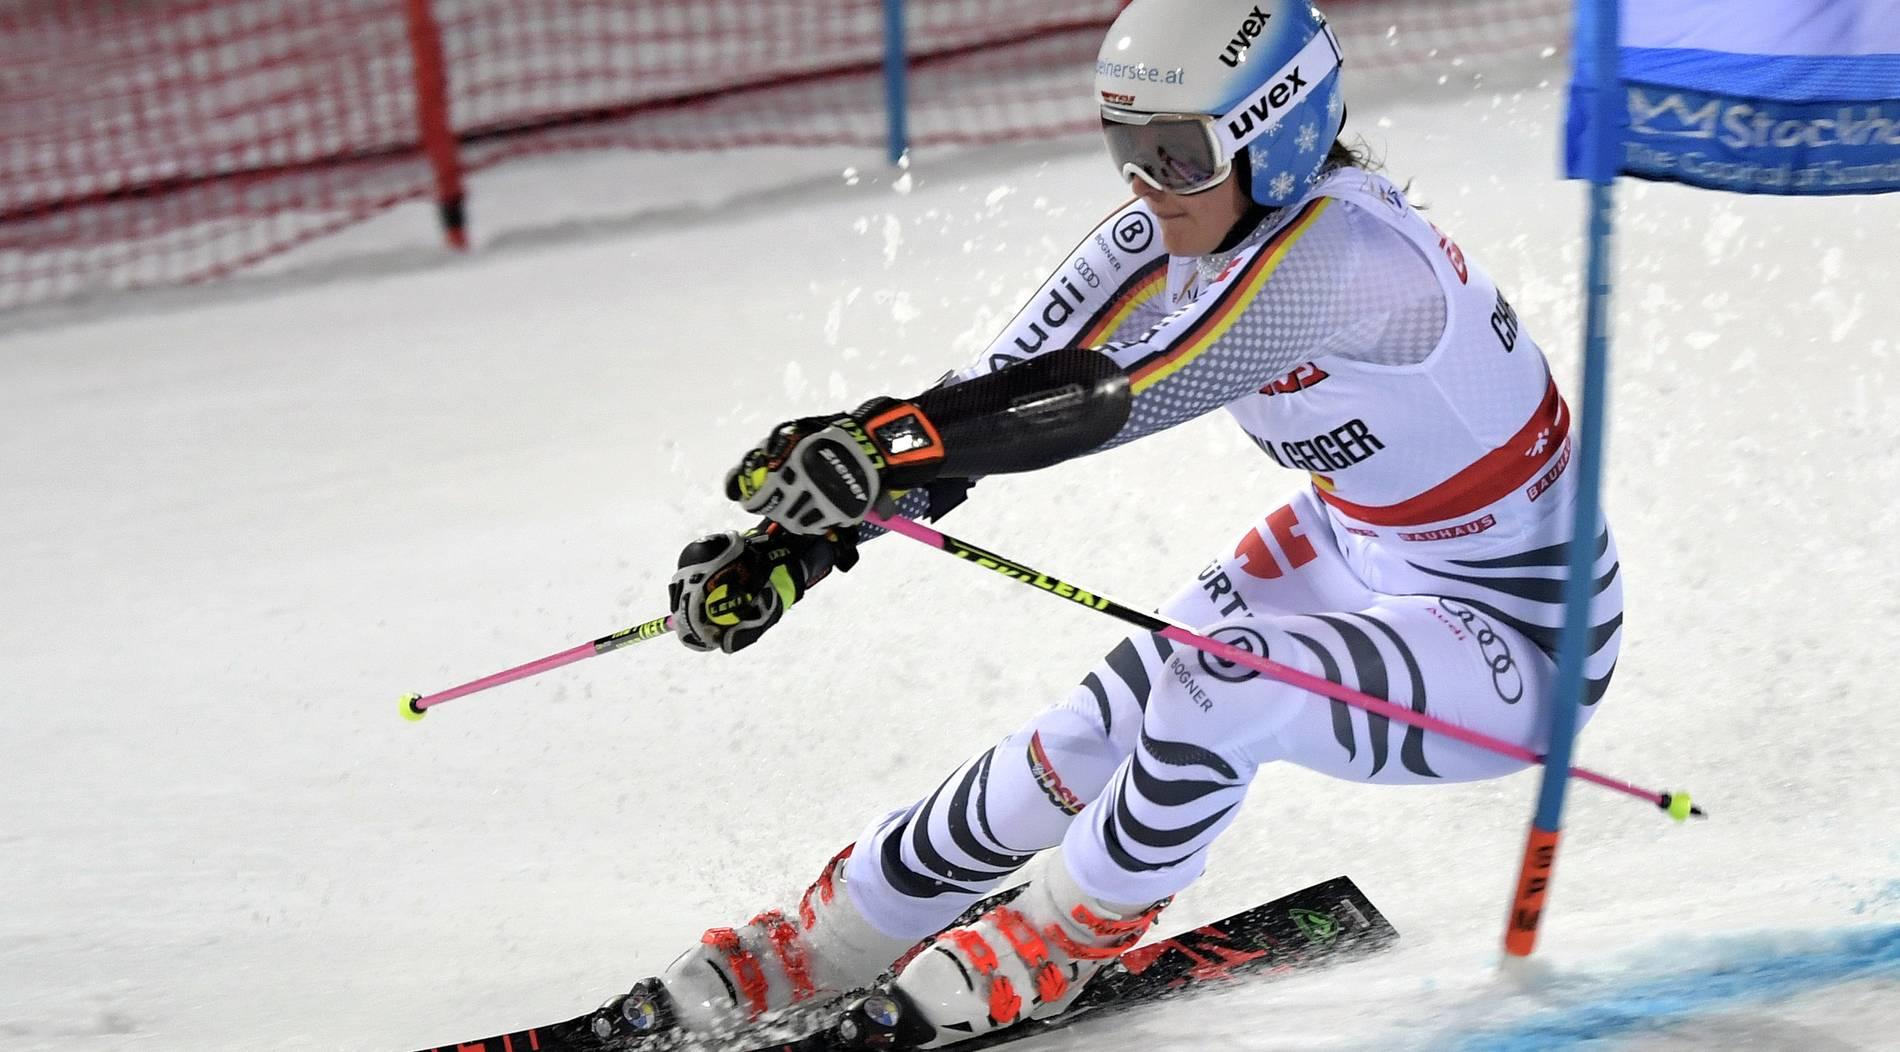 Geiger holt in Stockholm ihr bestes Weltcup-Resultat